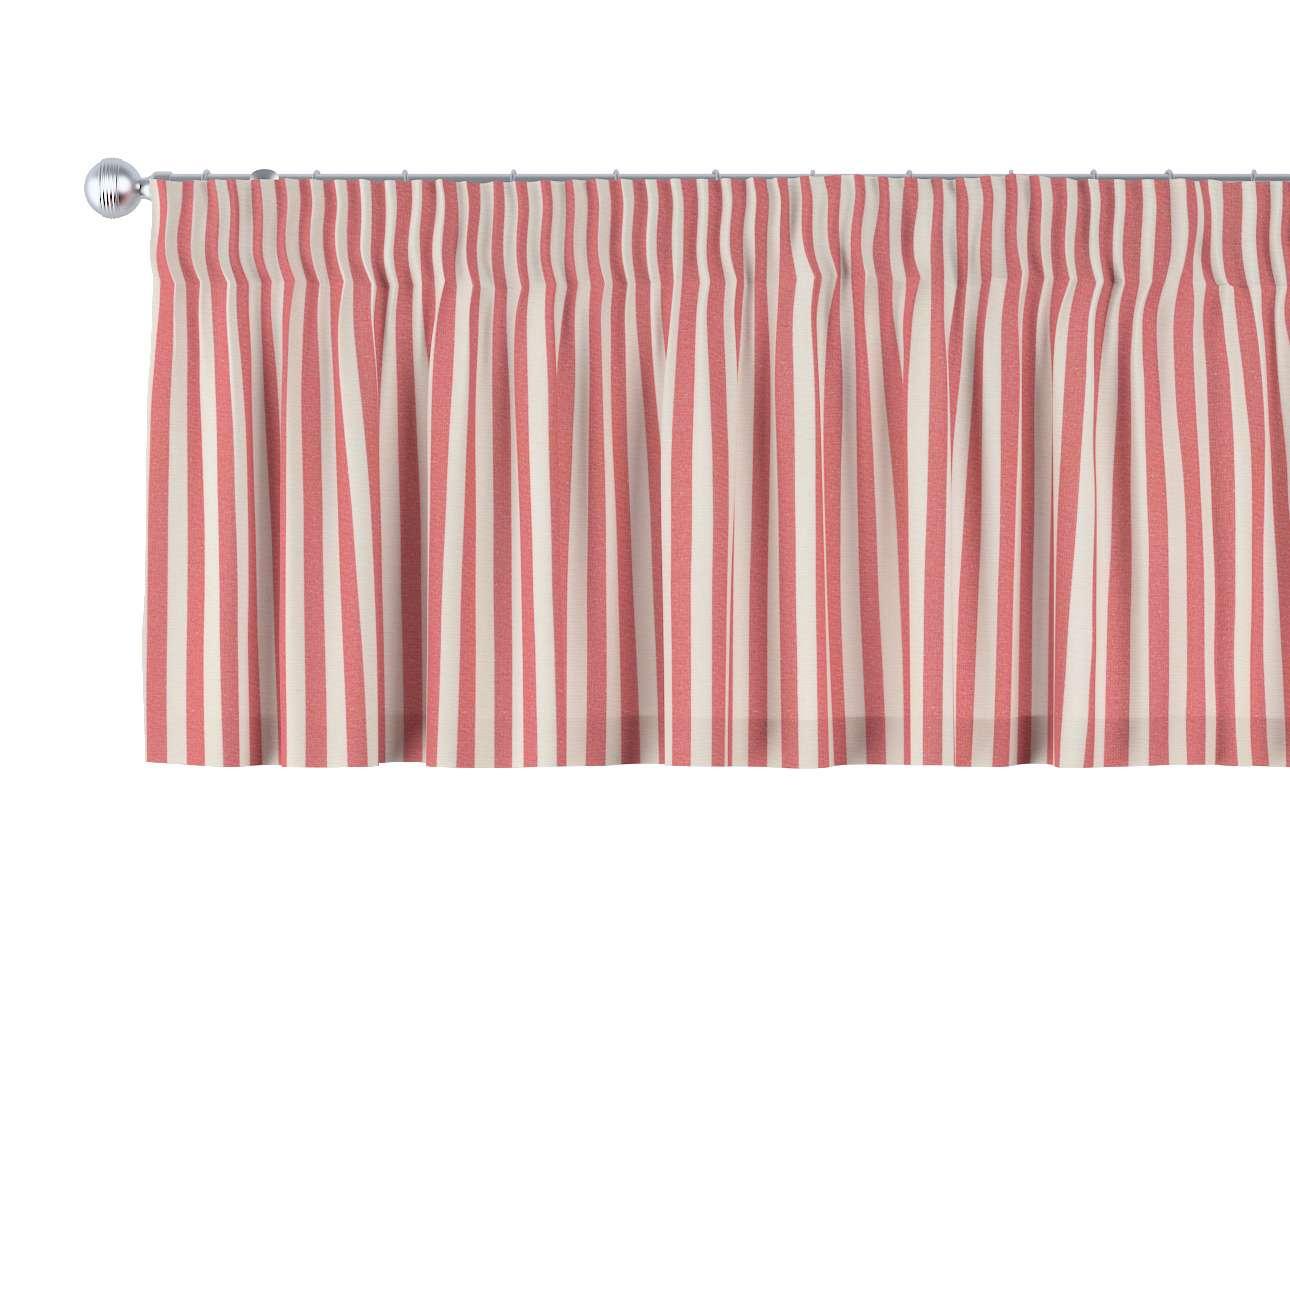 Kurzgardine mit Kräuselband 130 x 40 cm von der Kollektion Quadro, Stoff: 136-17